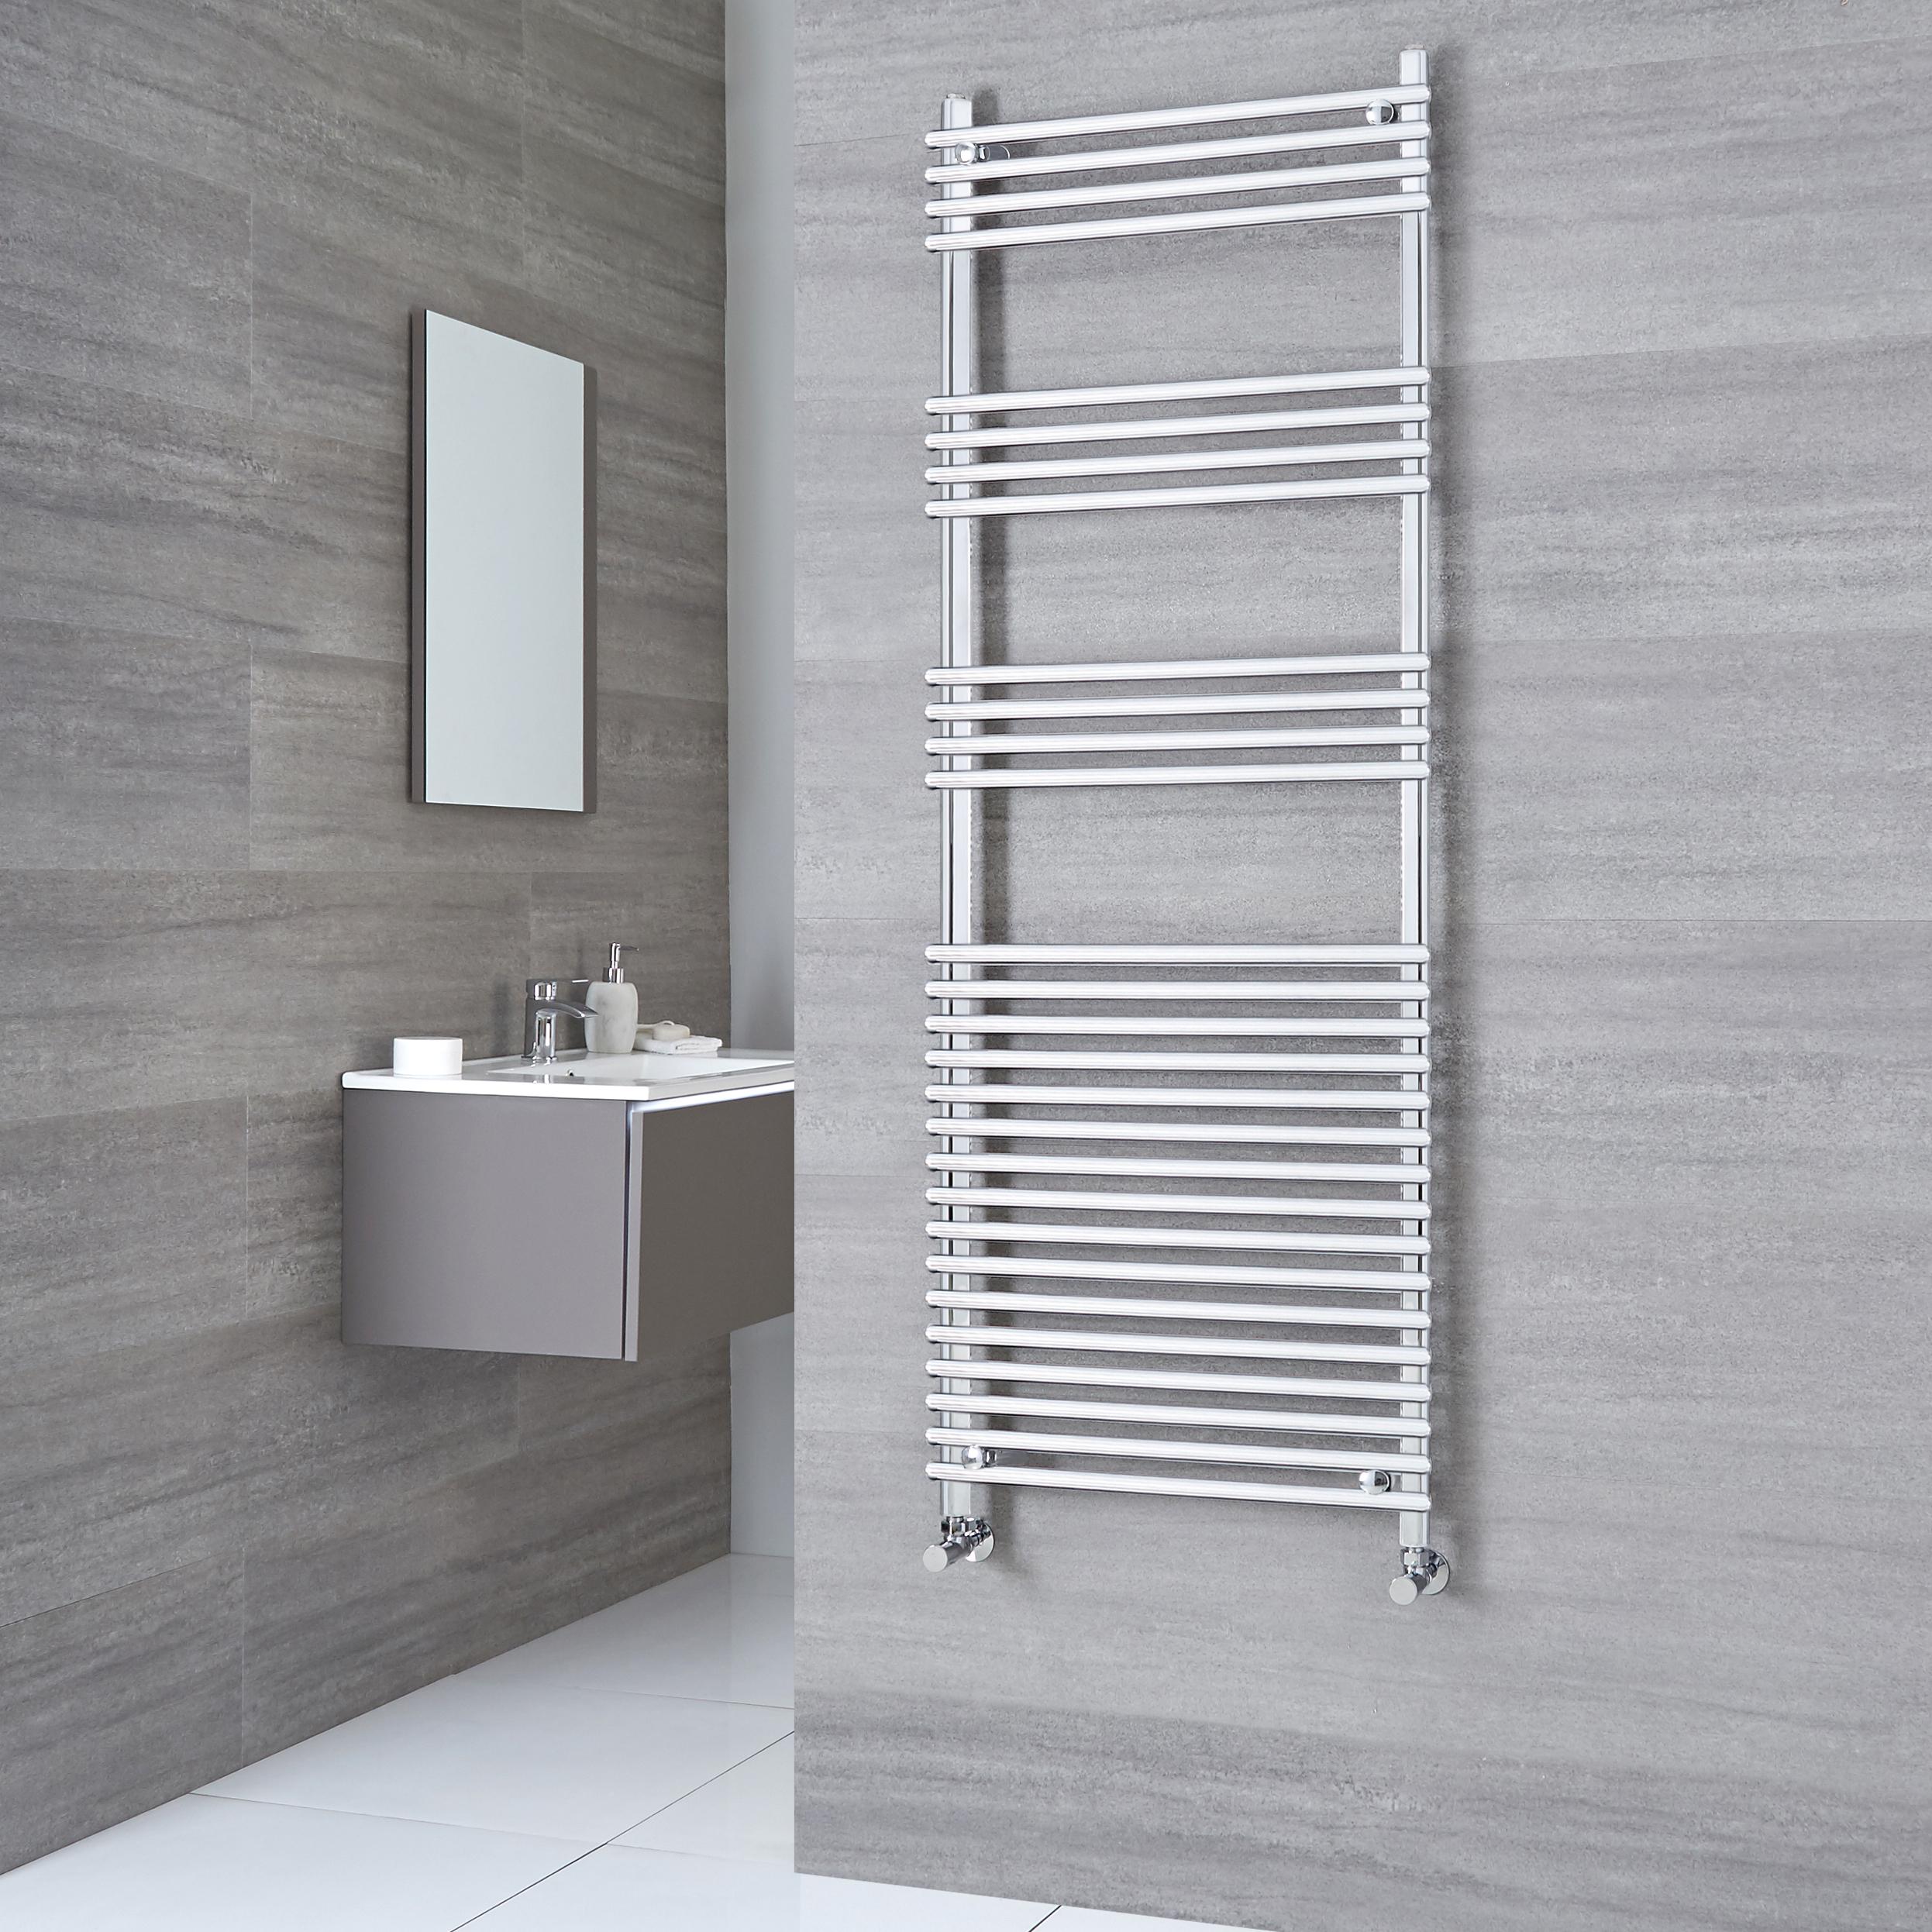 Kudox Harrogate - Chrome Flat Bar on Bar Heated Towel Rail - 1650mm x 600mm